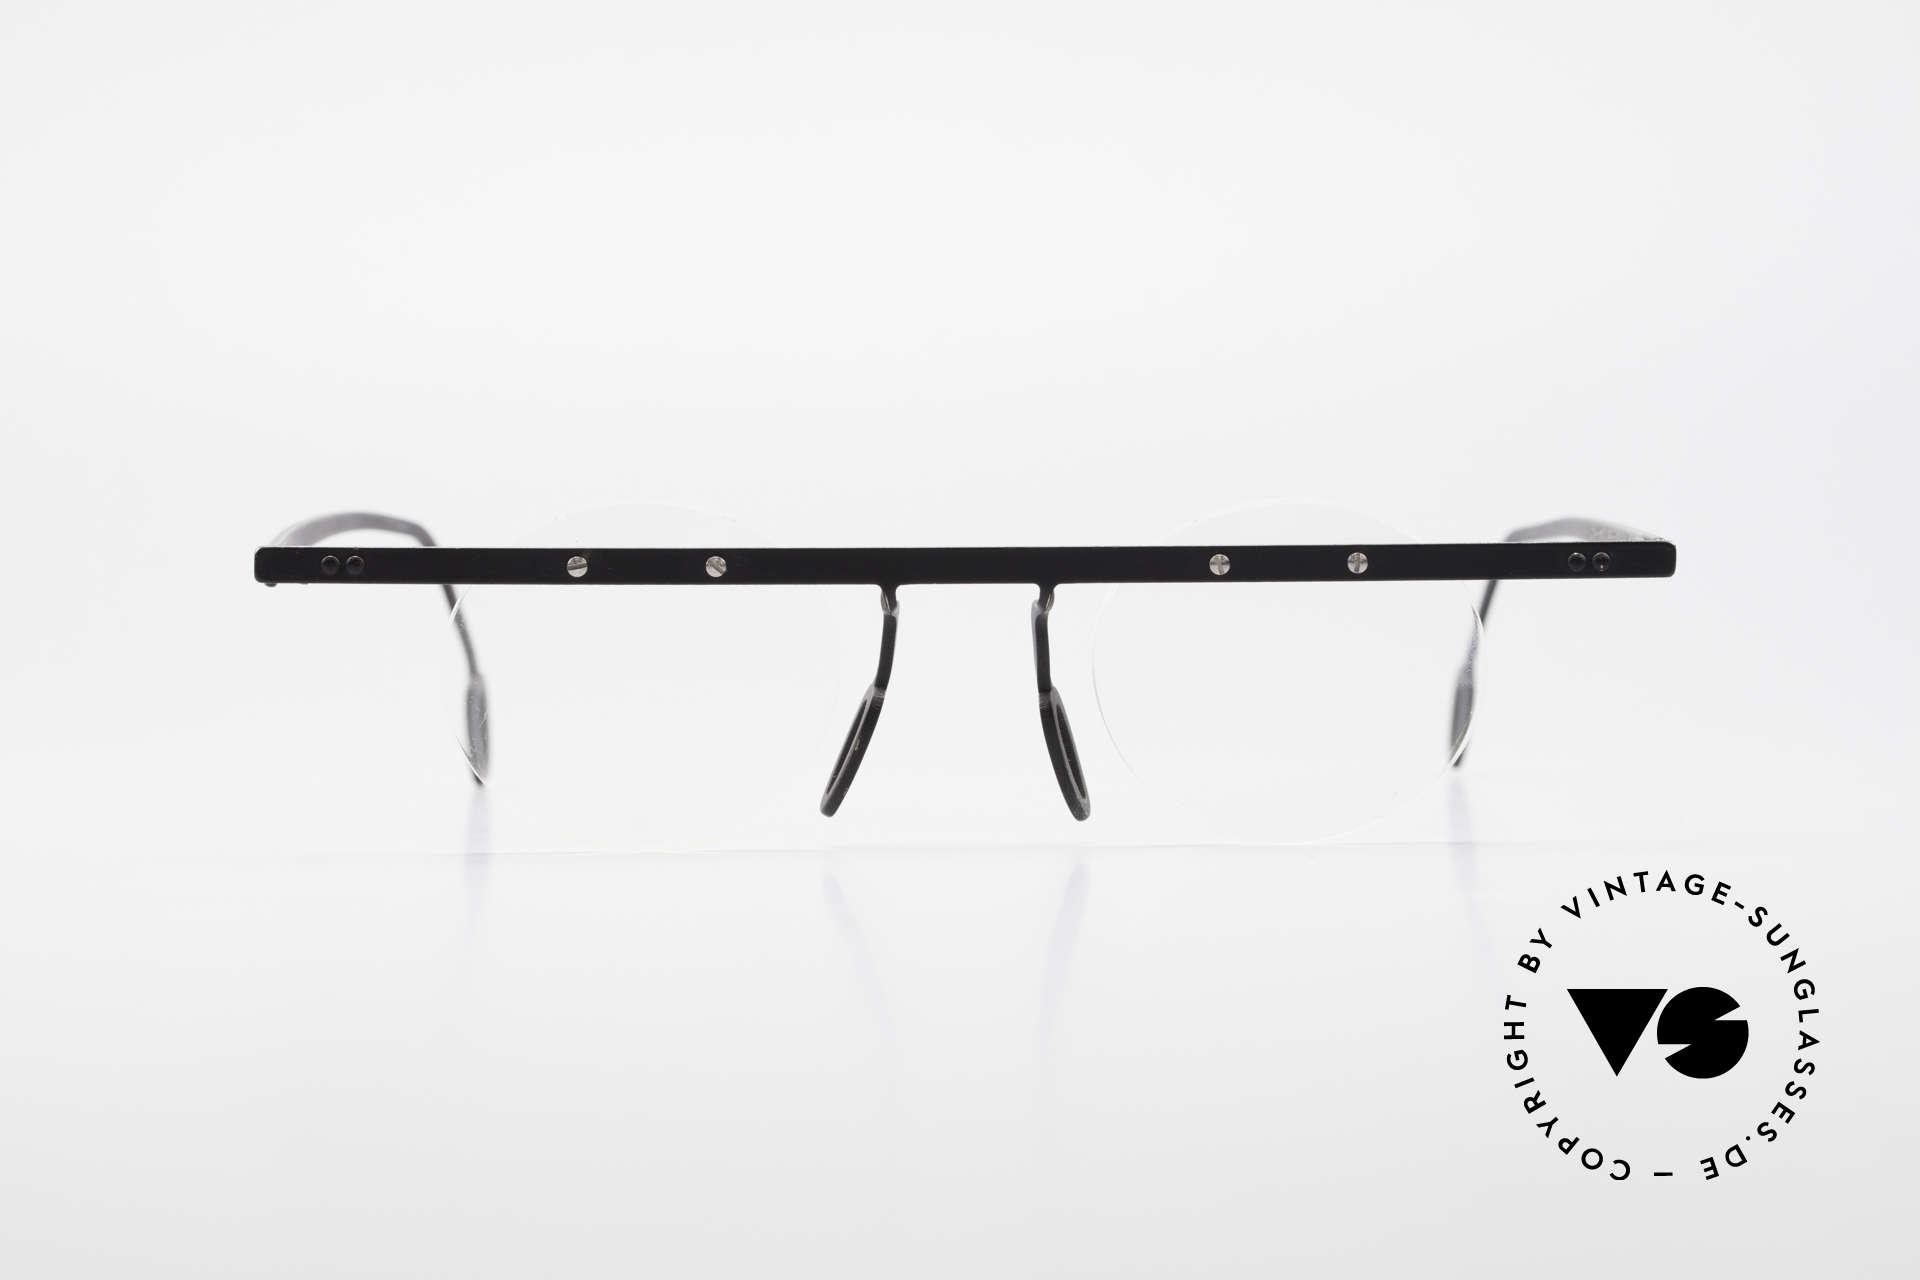 Theo Belgium Tita VII 11 Vintage Titanium Eyeglasses, founded in 1989 as 'anti mainstream' eyewear / glasses, Made for Men and Women